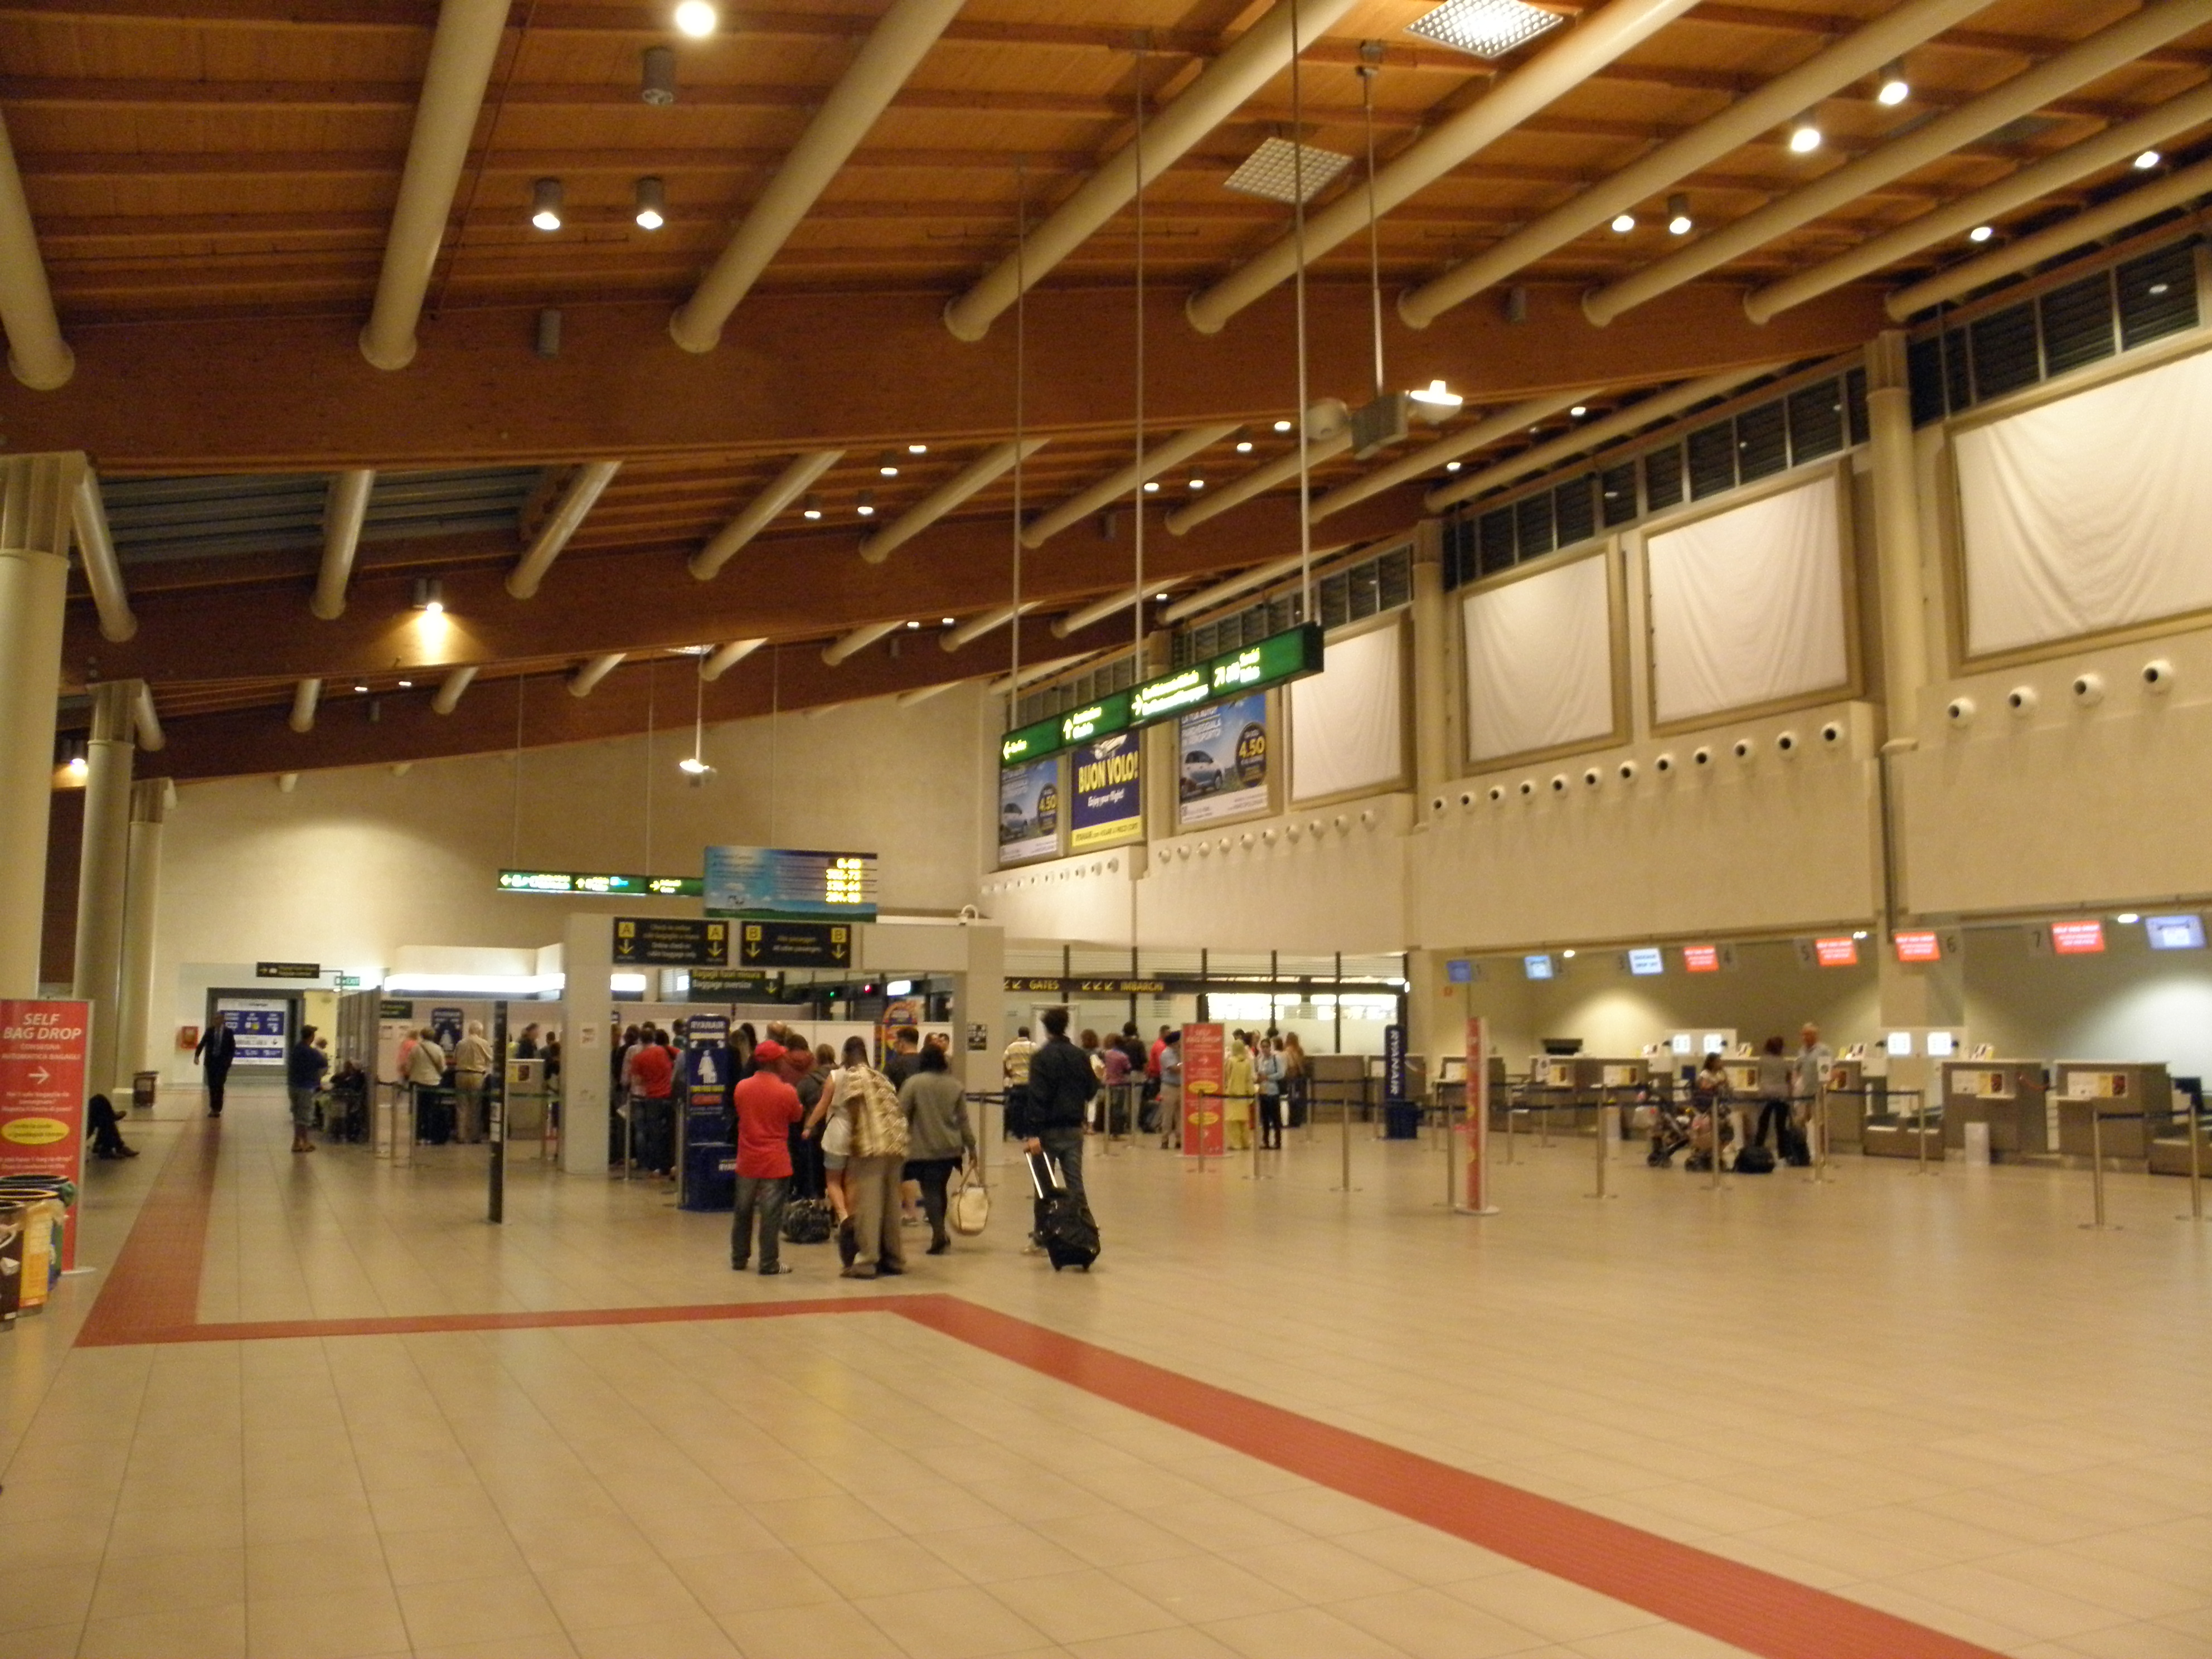 Aeroporto Venezia Treviso : File aeroporto di treviso sant angelo terminal interno